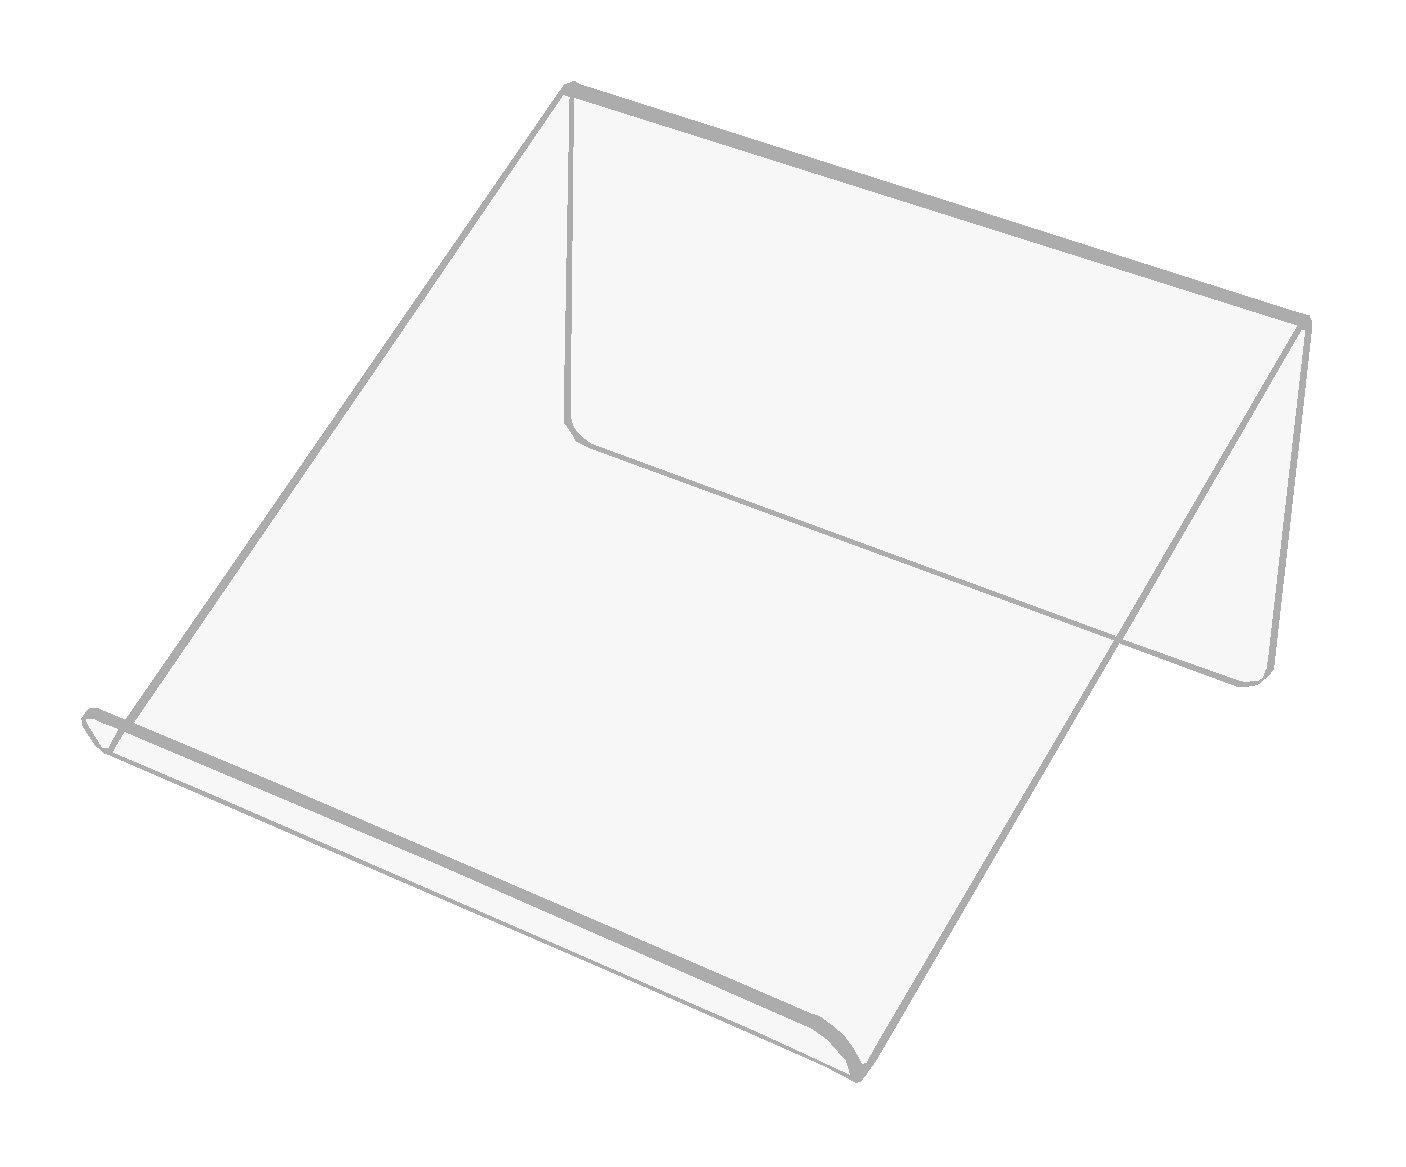 Stojan Stand 20 cm Tablet Book s Plexiglass 3mm